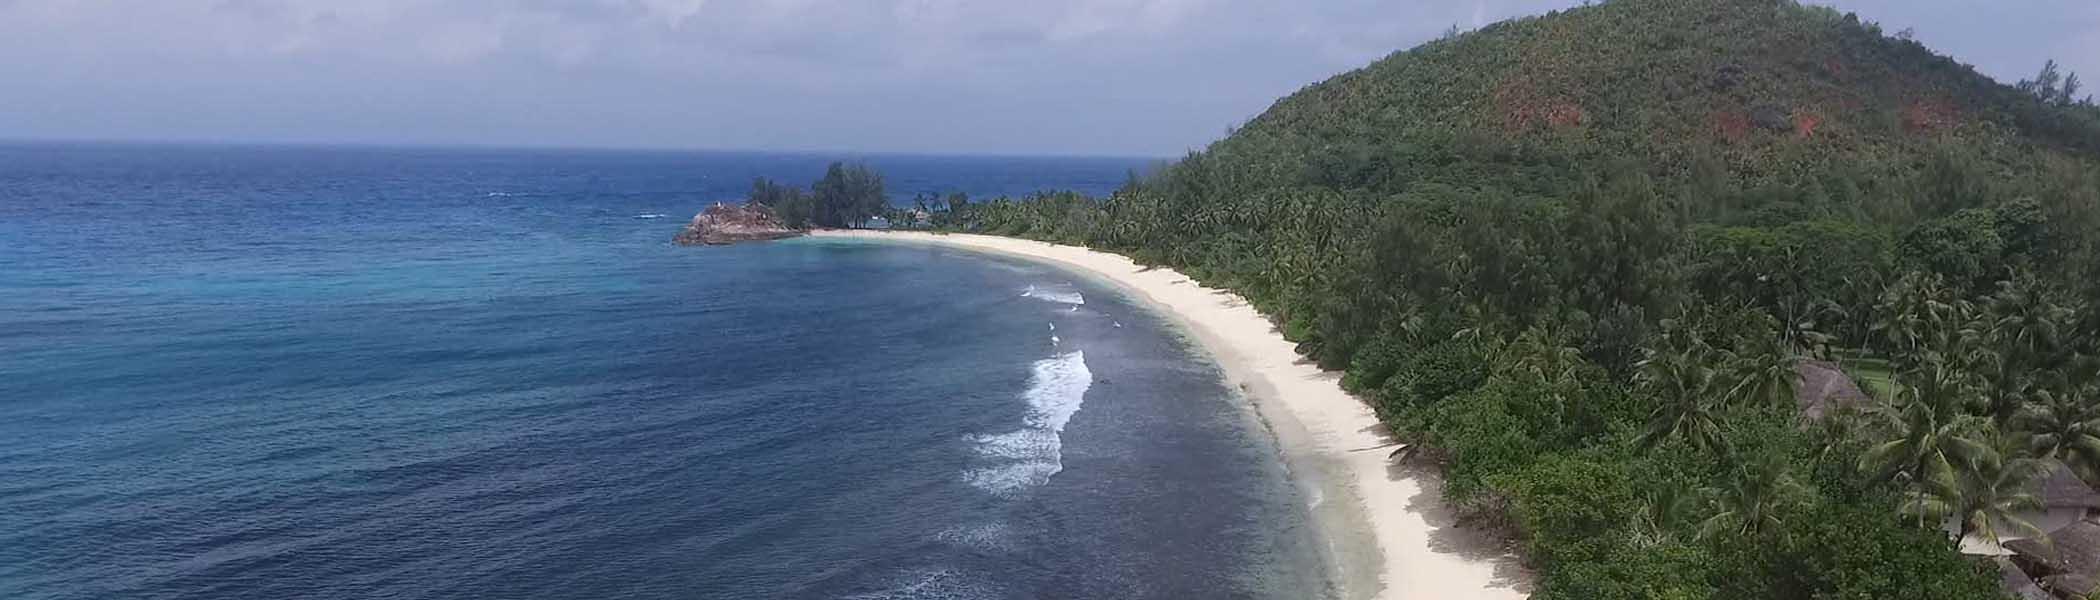 anse-kerlan, Beaches in Seychelles Islands